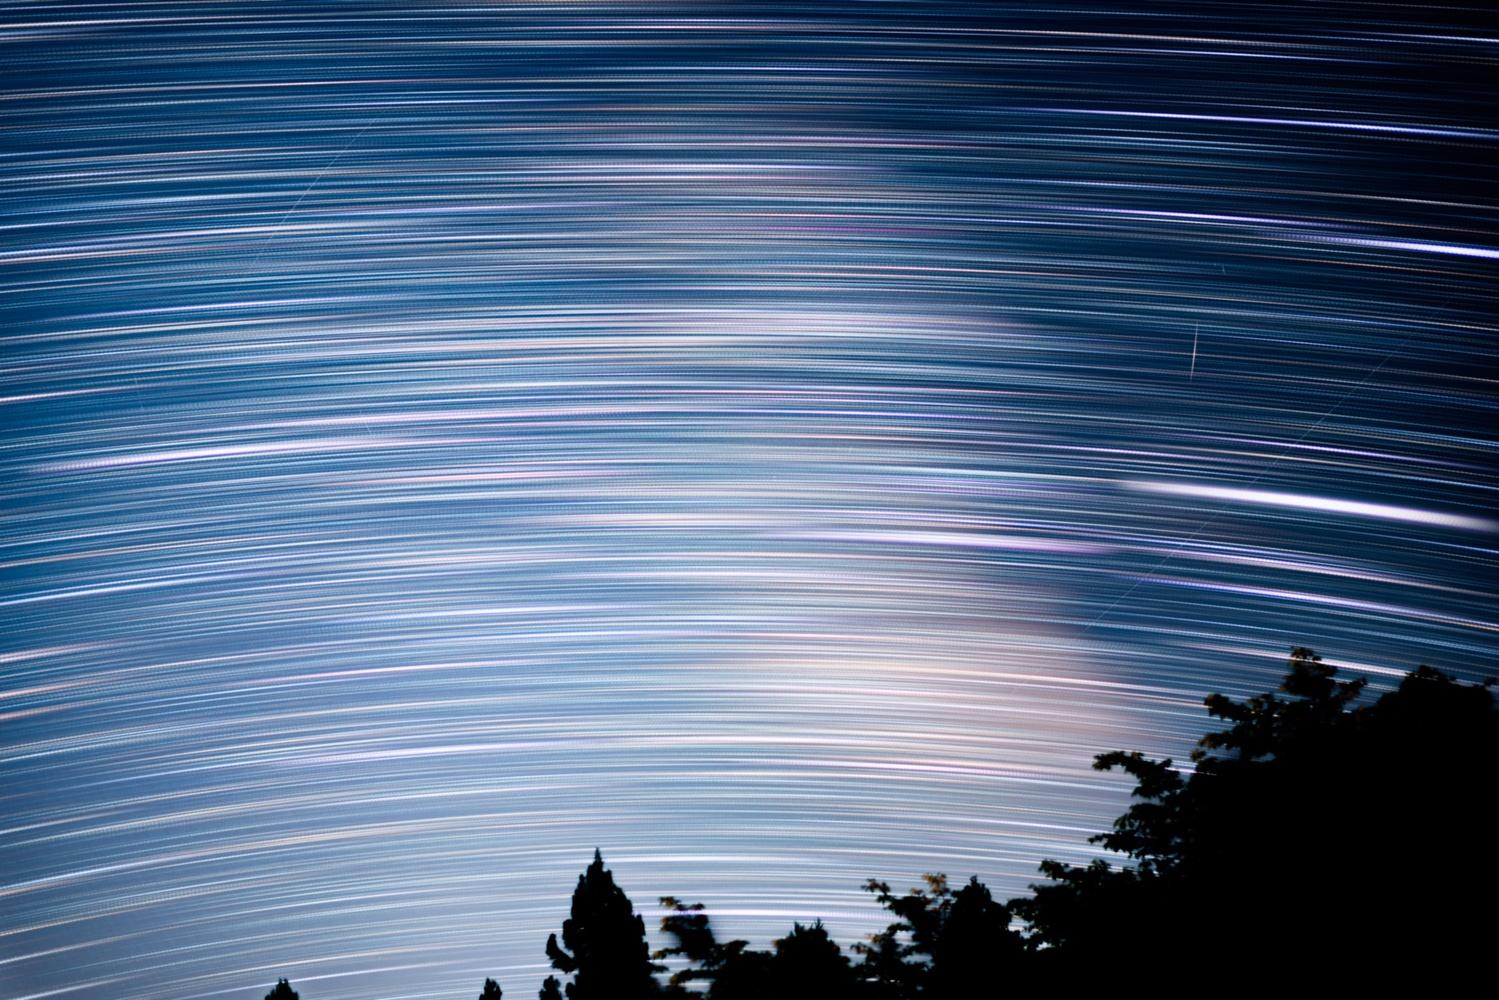 Star trail by Masataka Inada